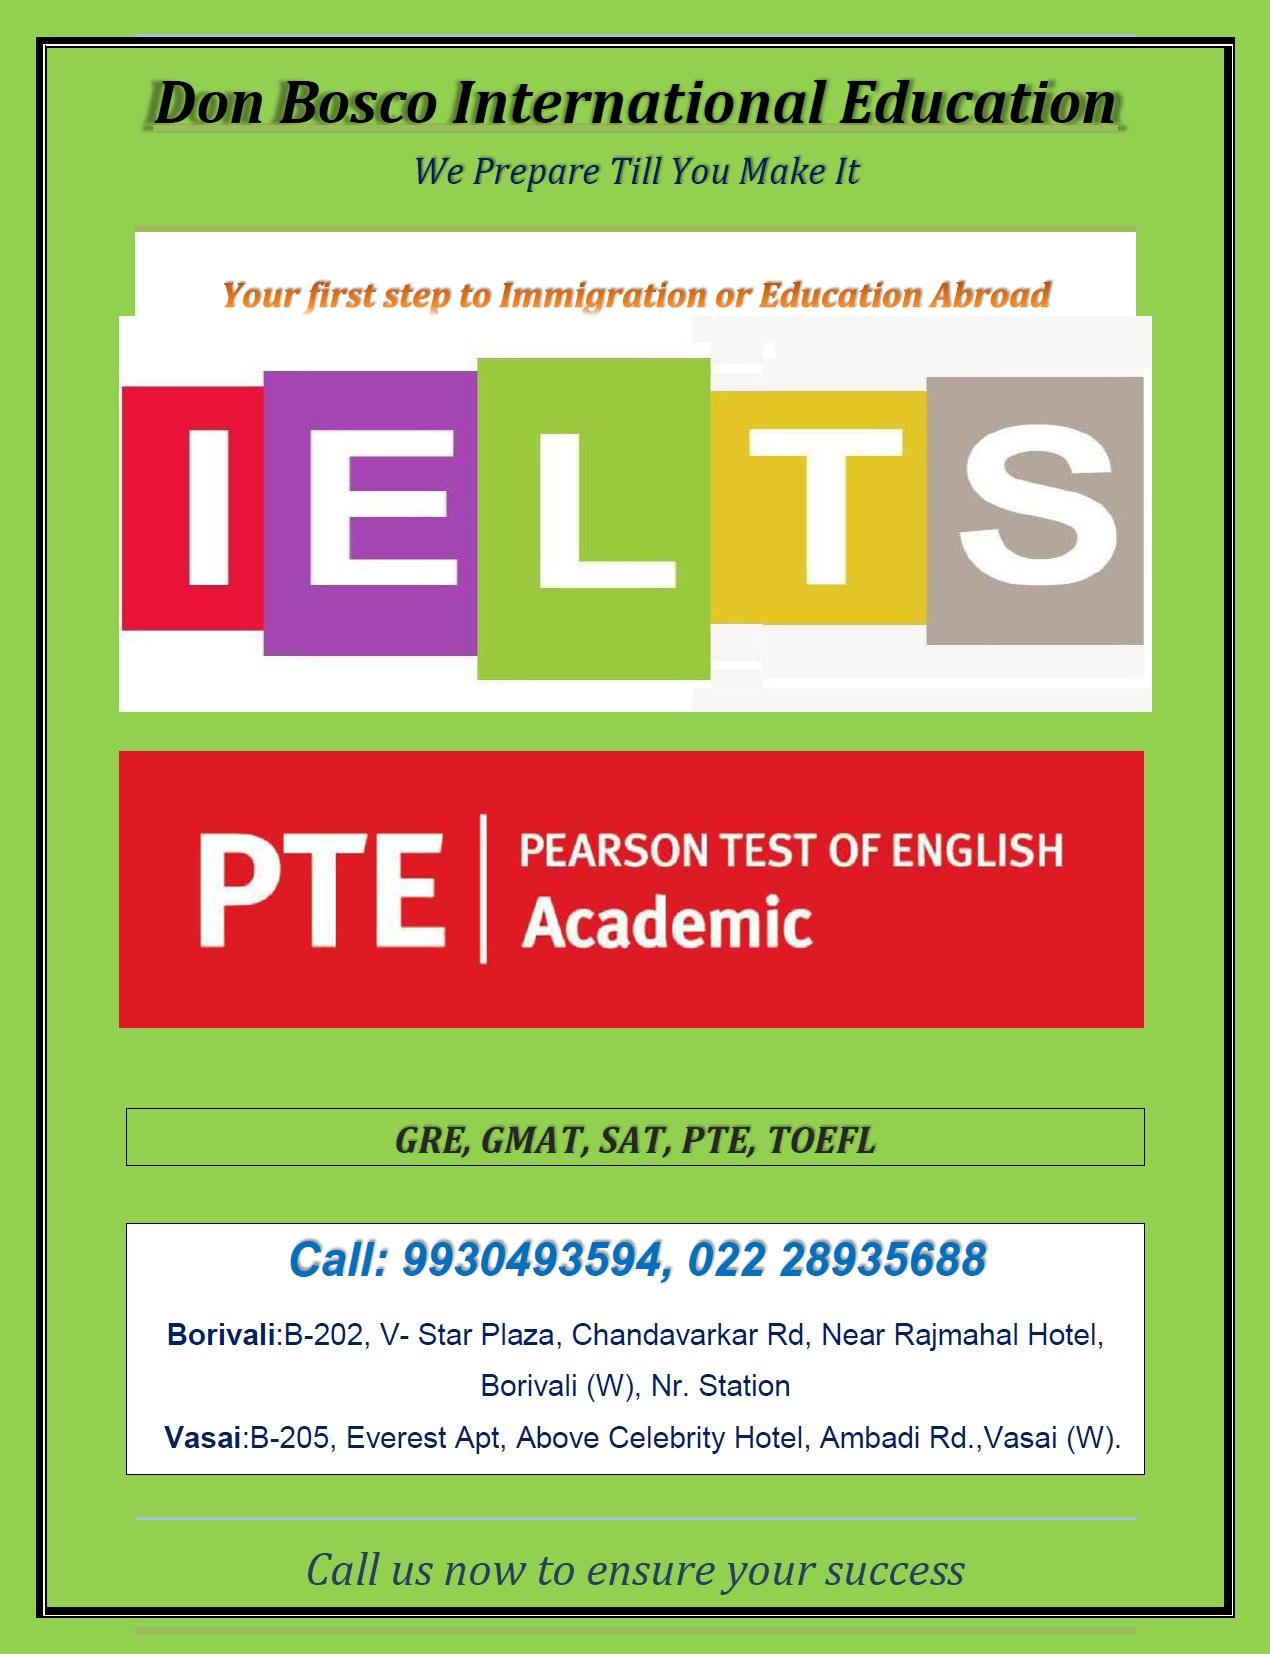 Top 10 PTE Coaching Classes in Mumbai, Training Centres | Sulekha Mumbai